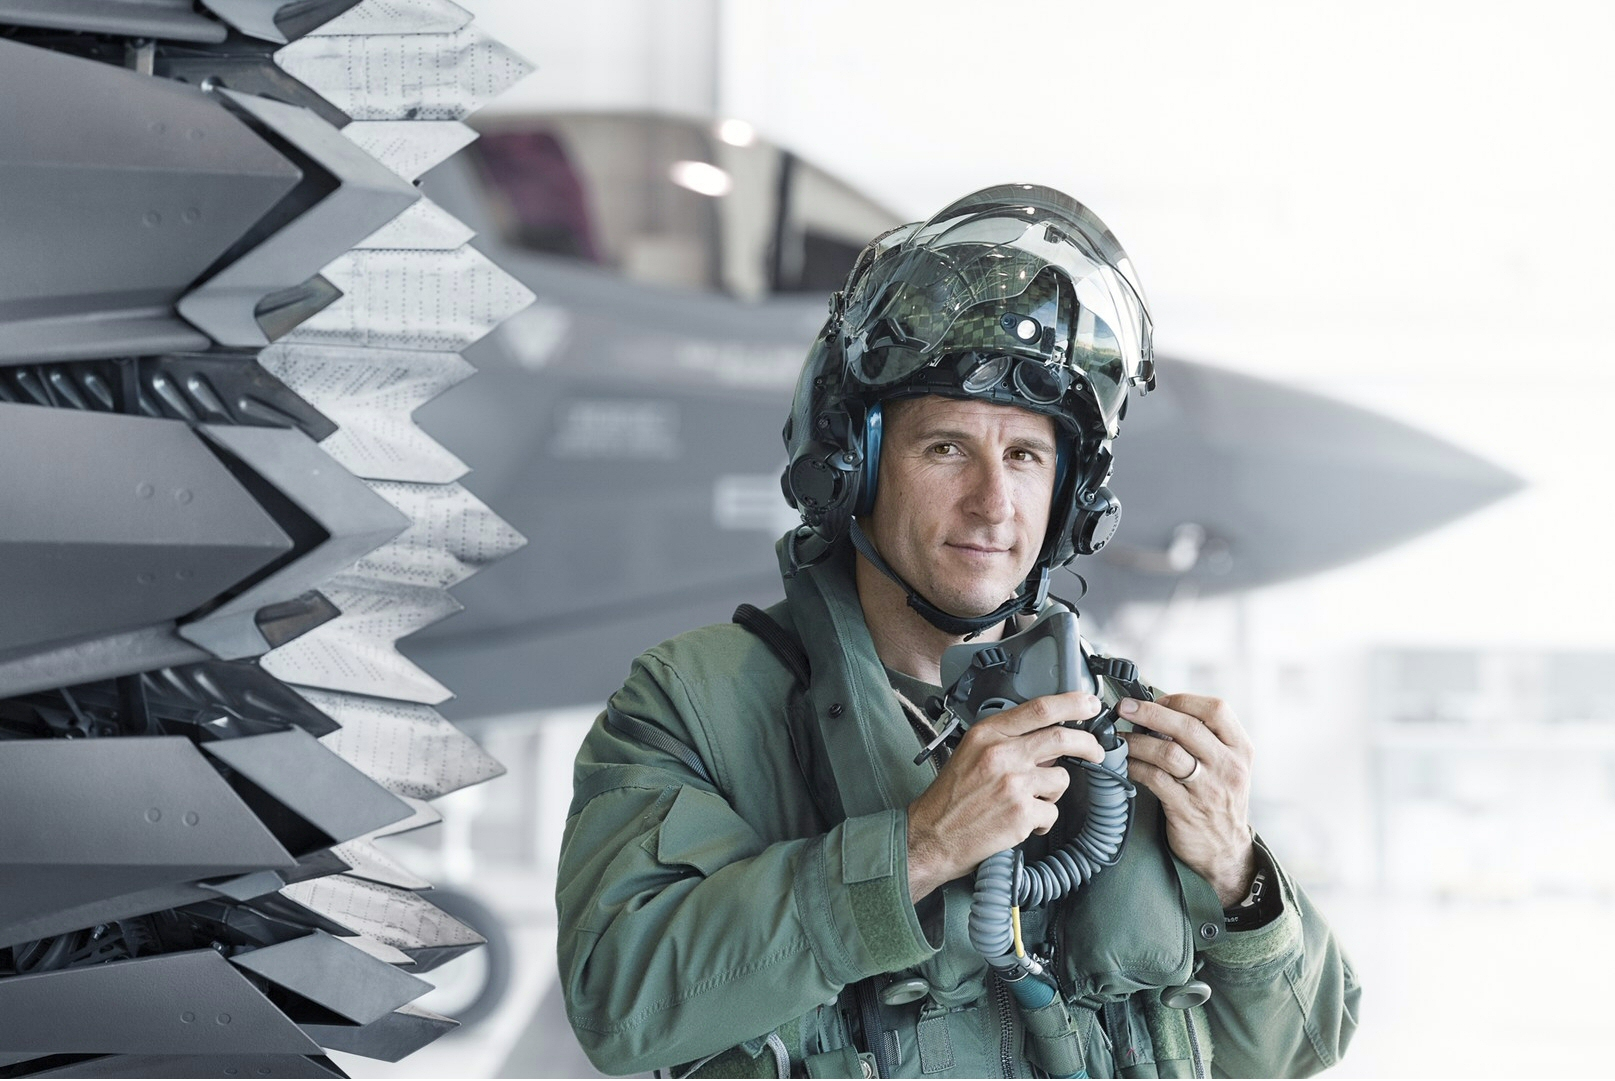 'Lt. Col. David Burke F35 Pilot' by Stephen Wilkes